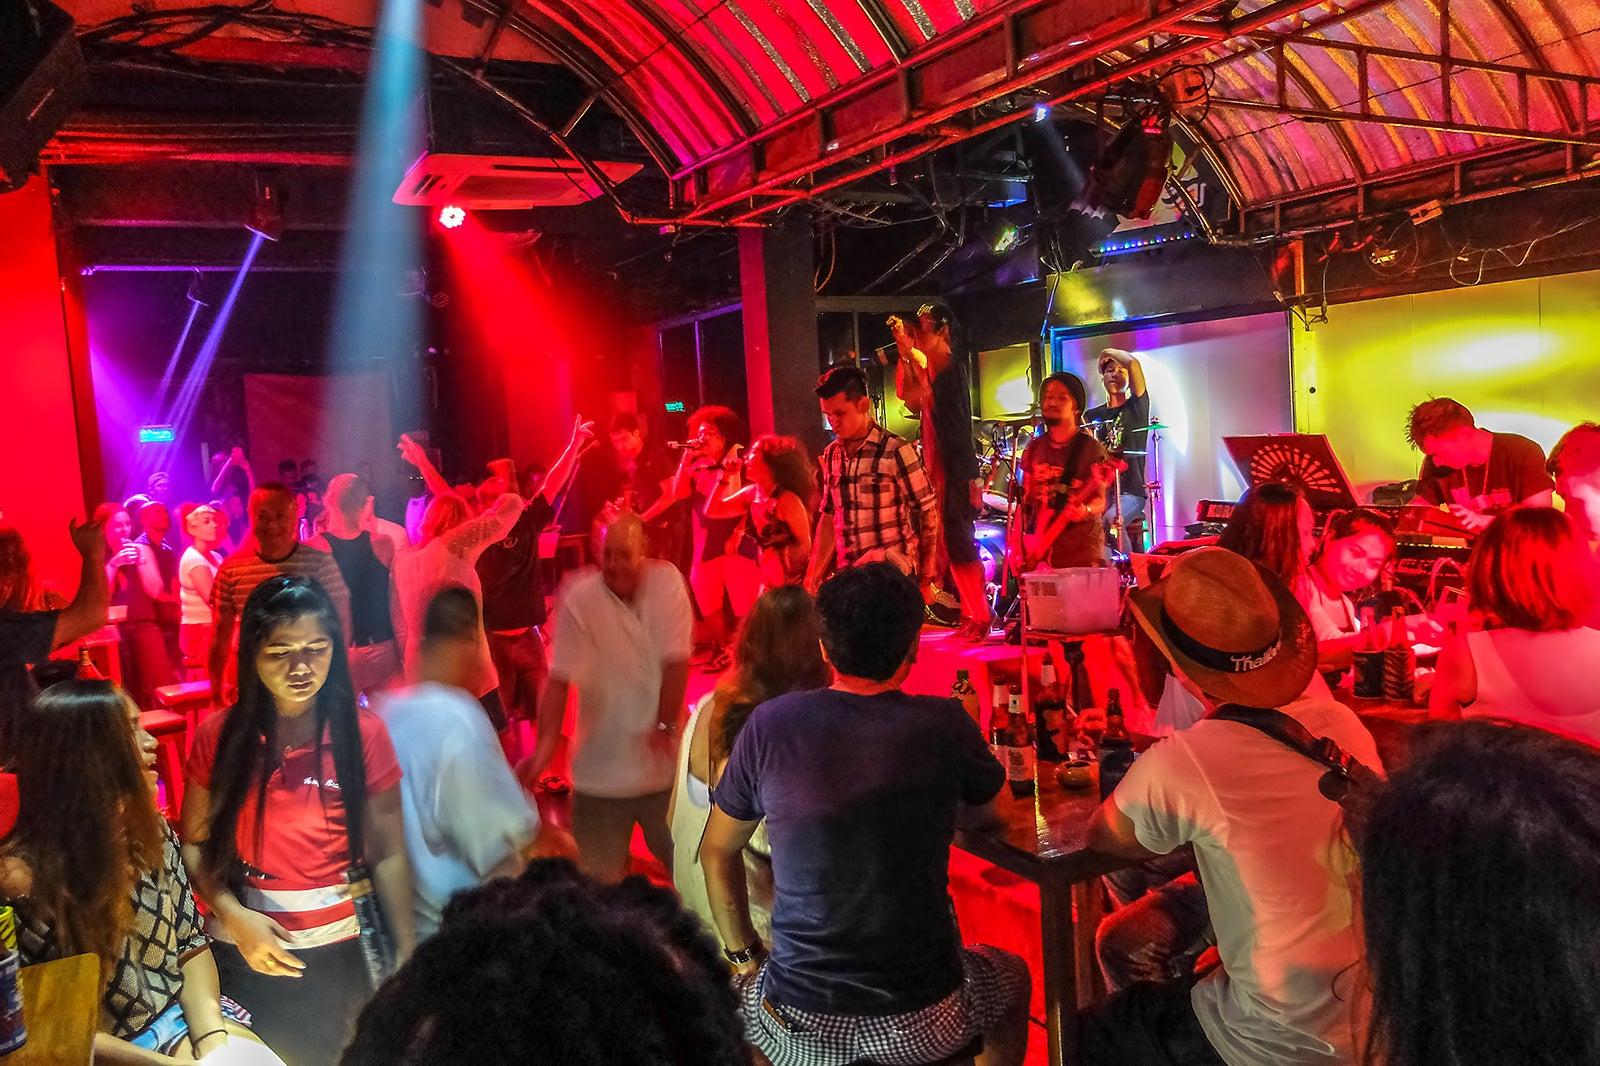 7 Best Live Music Bars in Phuket - Best Places for Phuket Live Music